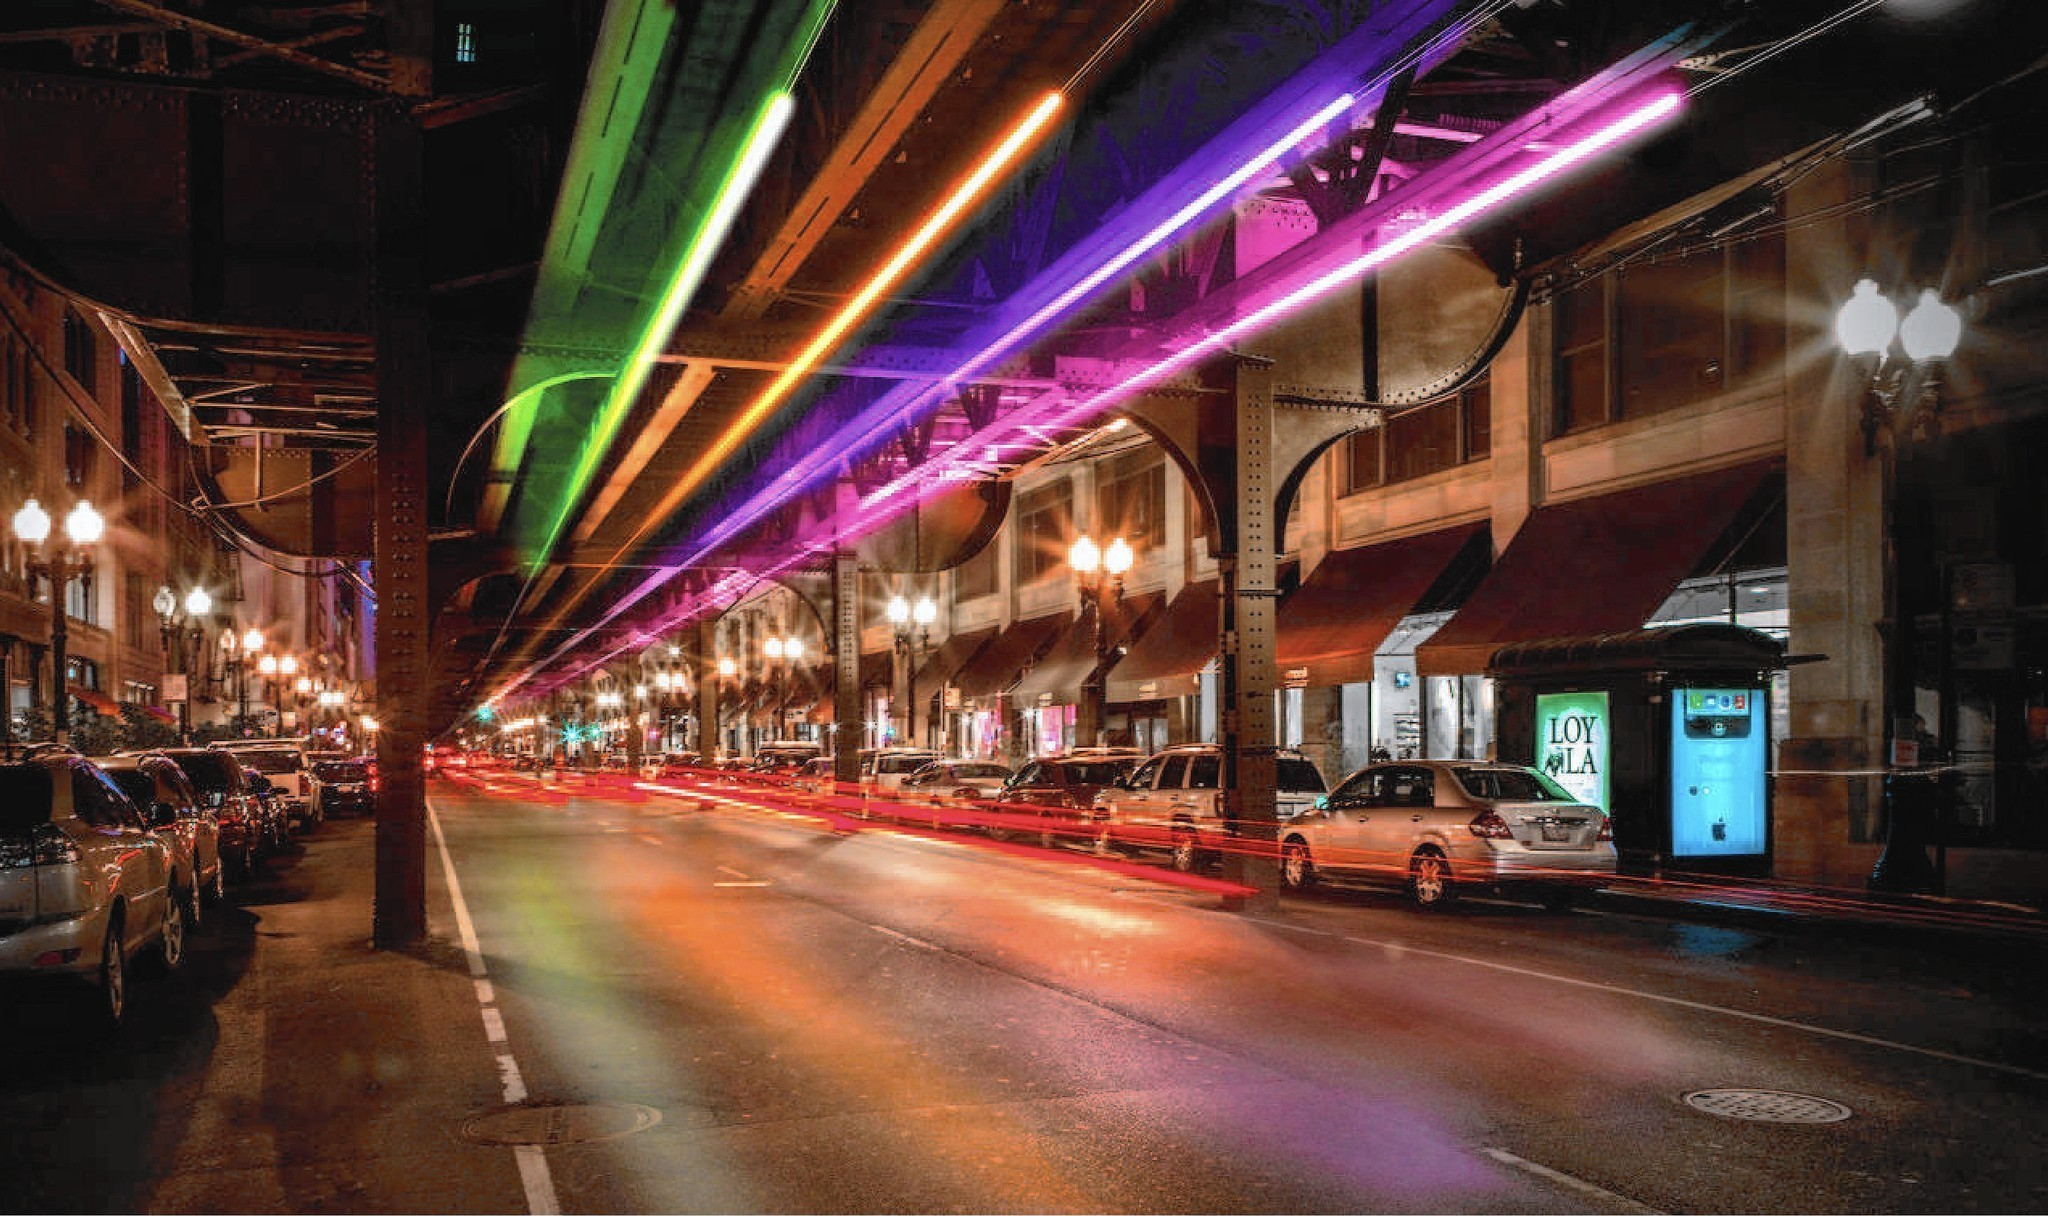 Led night light kickstarter - Wabash Lights Exceeds Kickstarter Goal Hopes To Begin Test This Fall Chicago Tribune